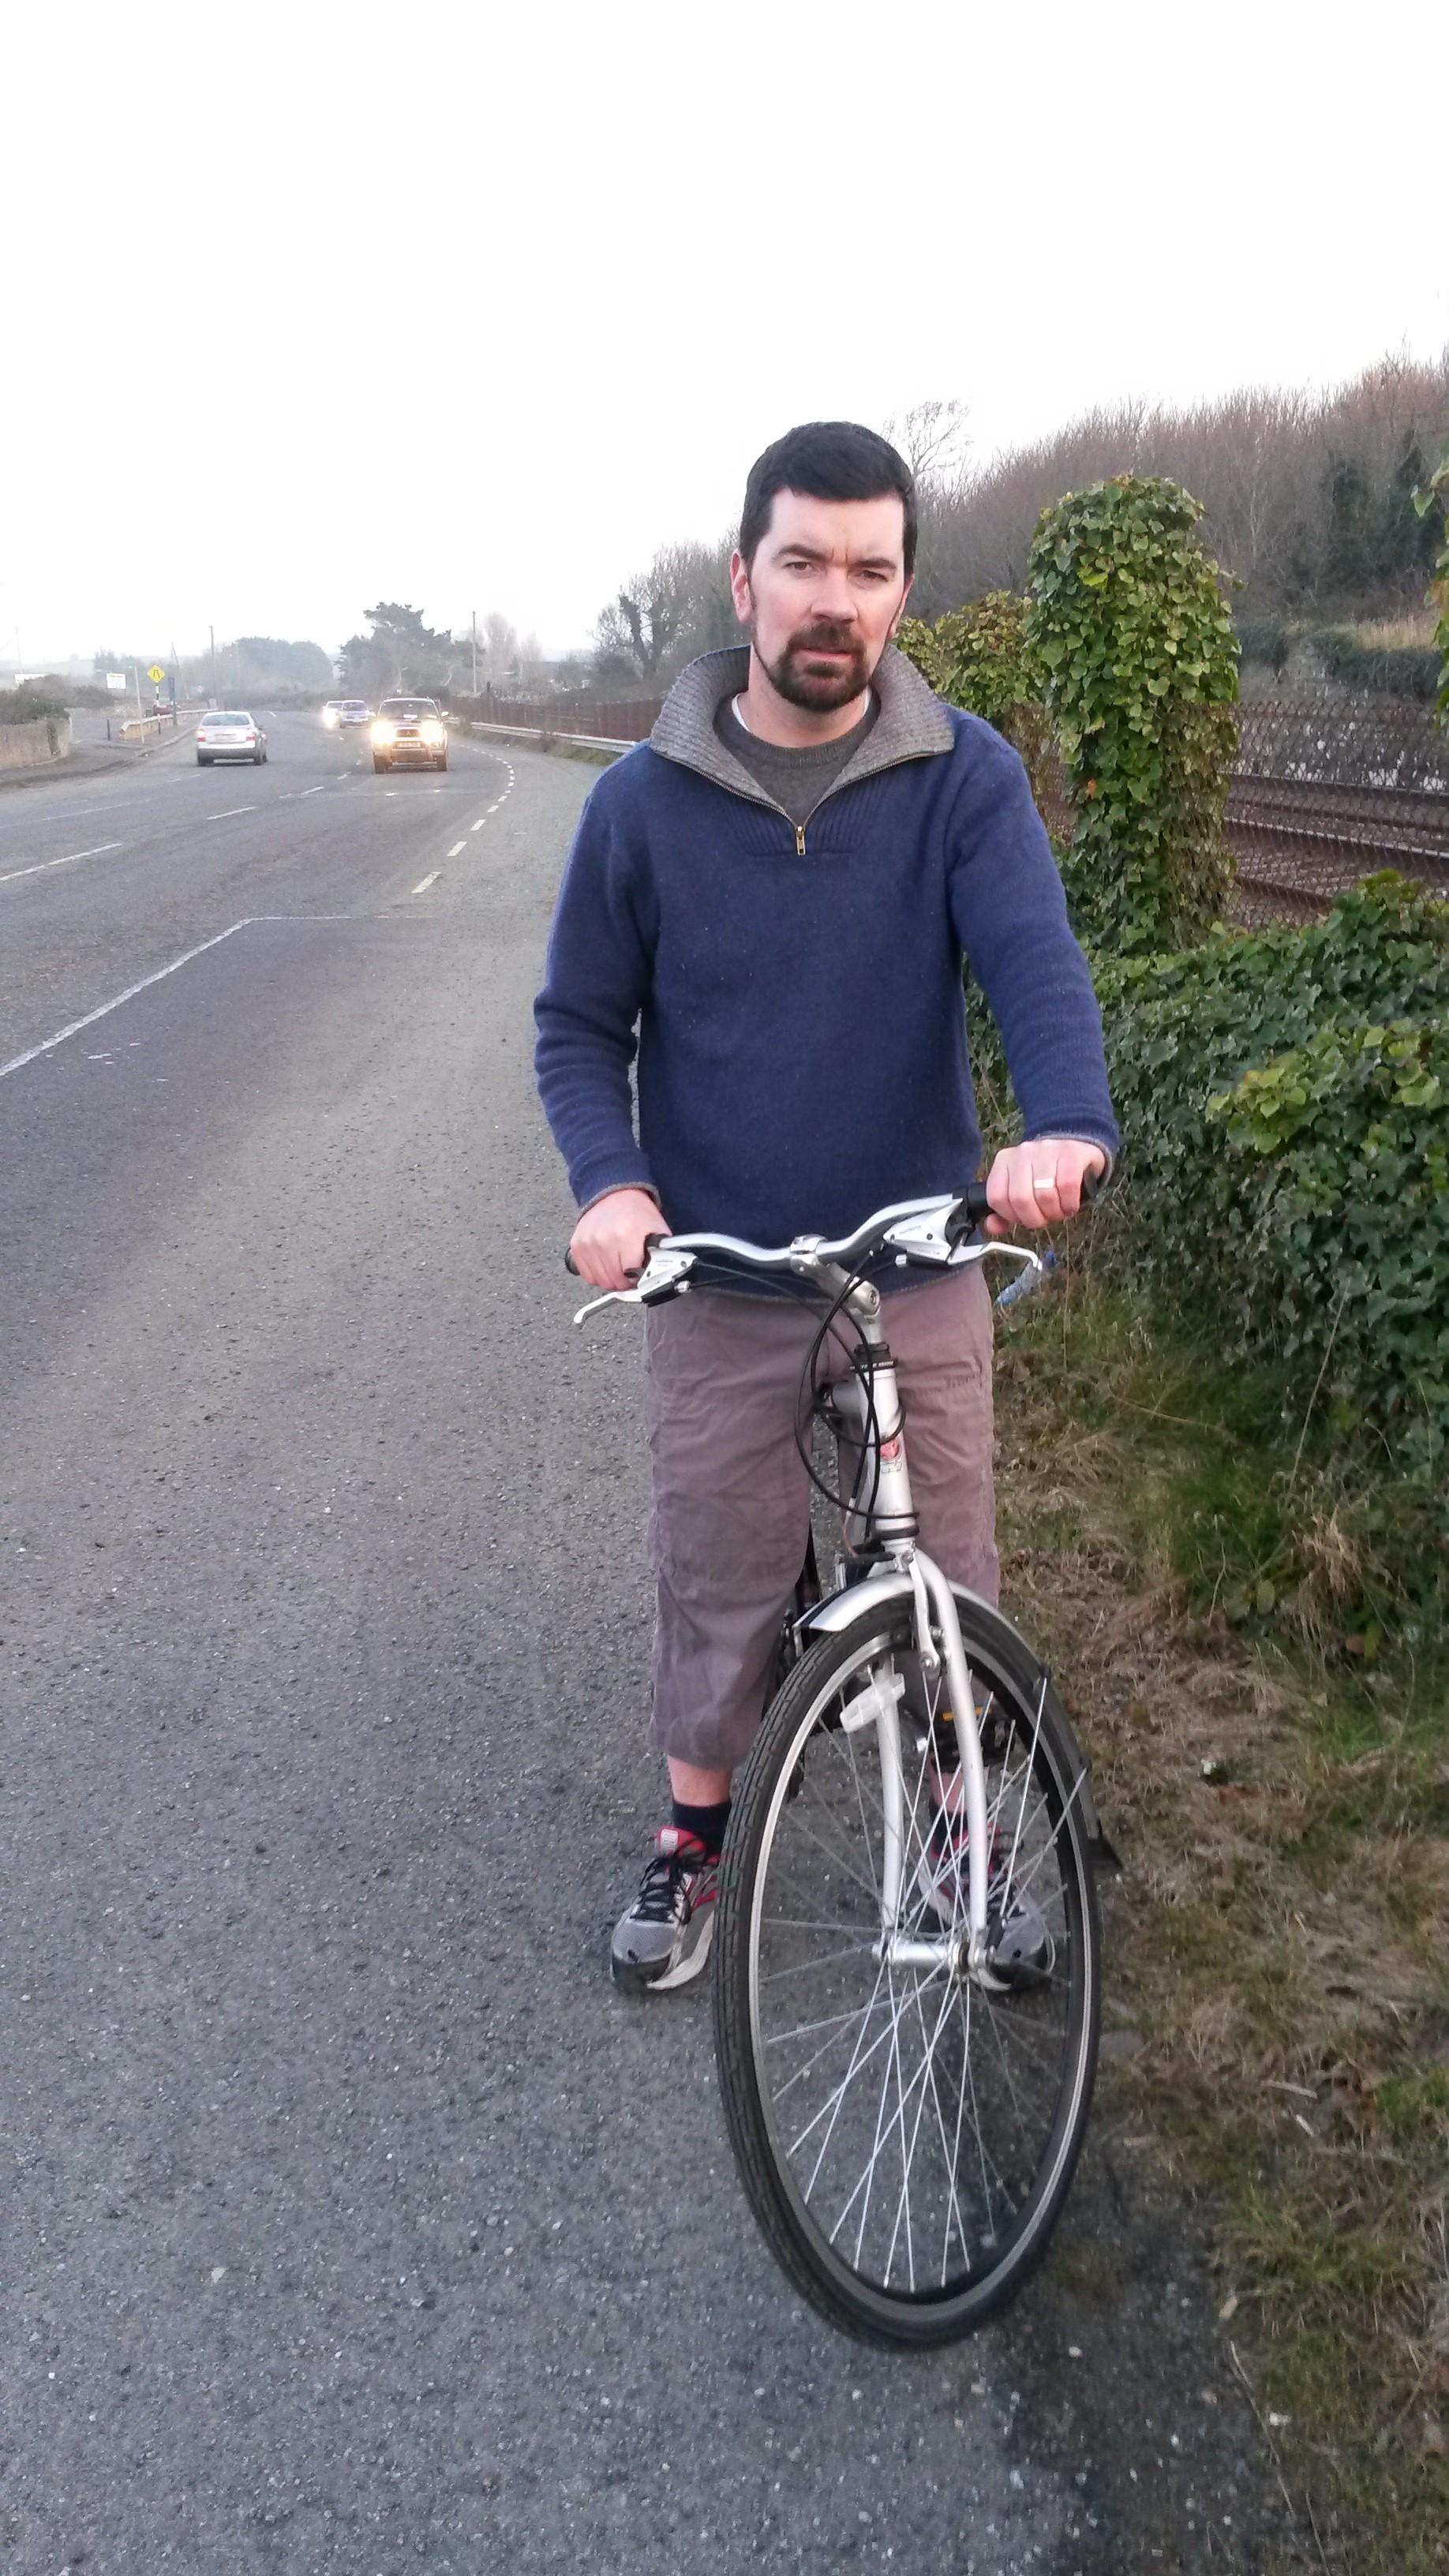 Joe O'Brien on Balbriggan Skerries road